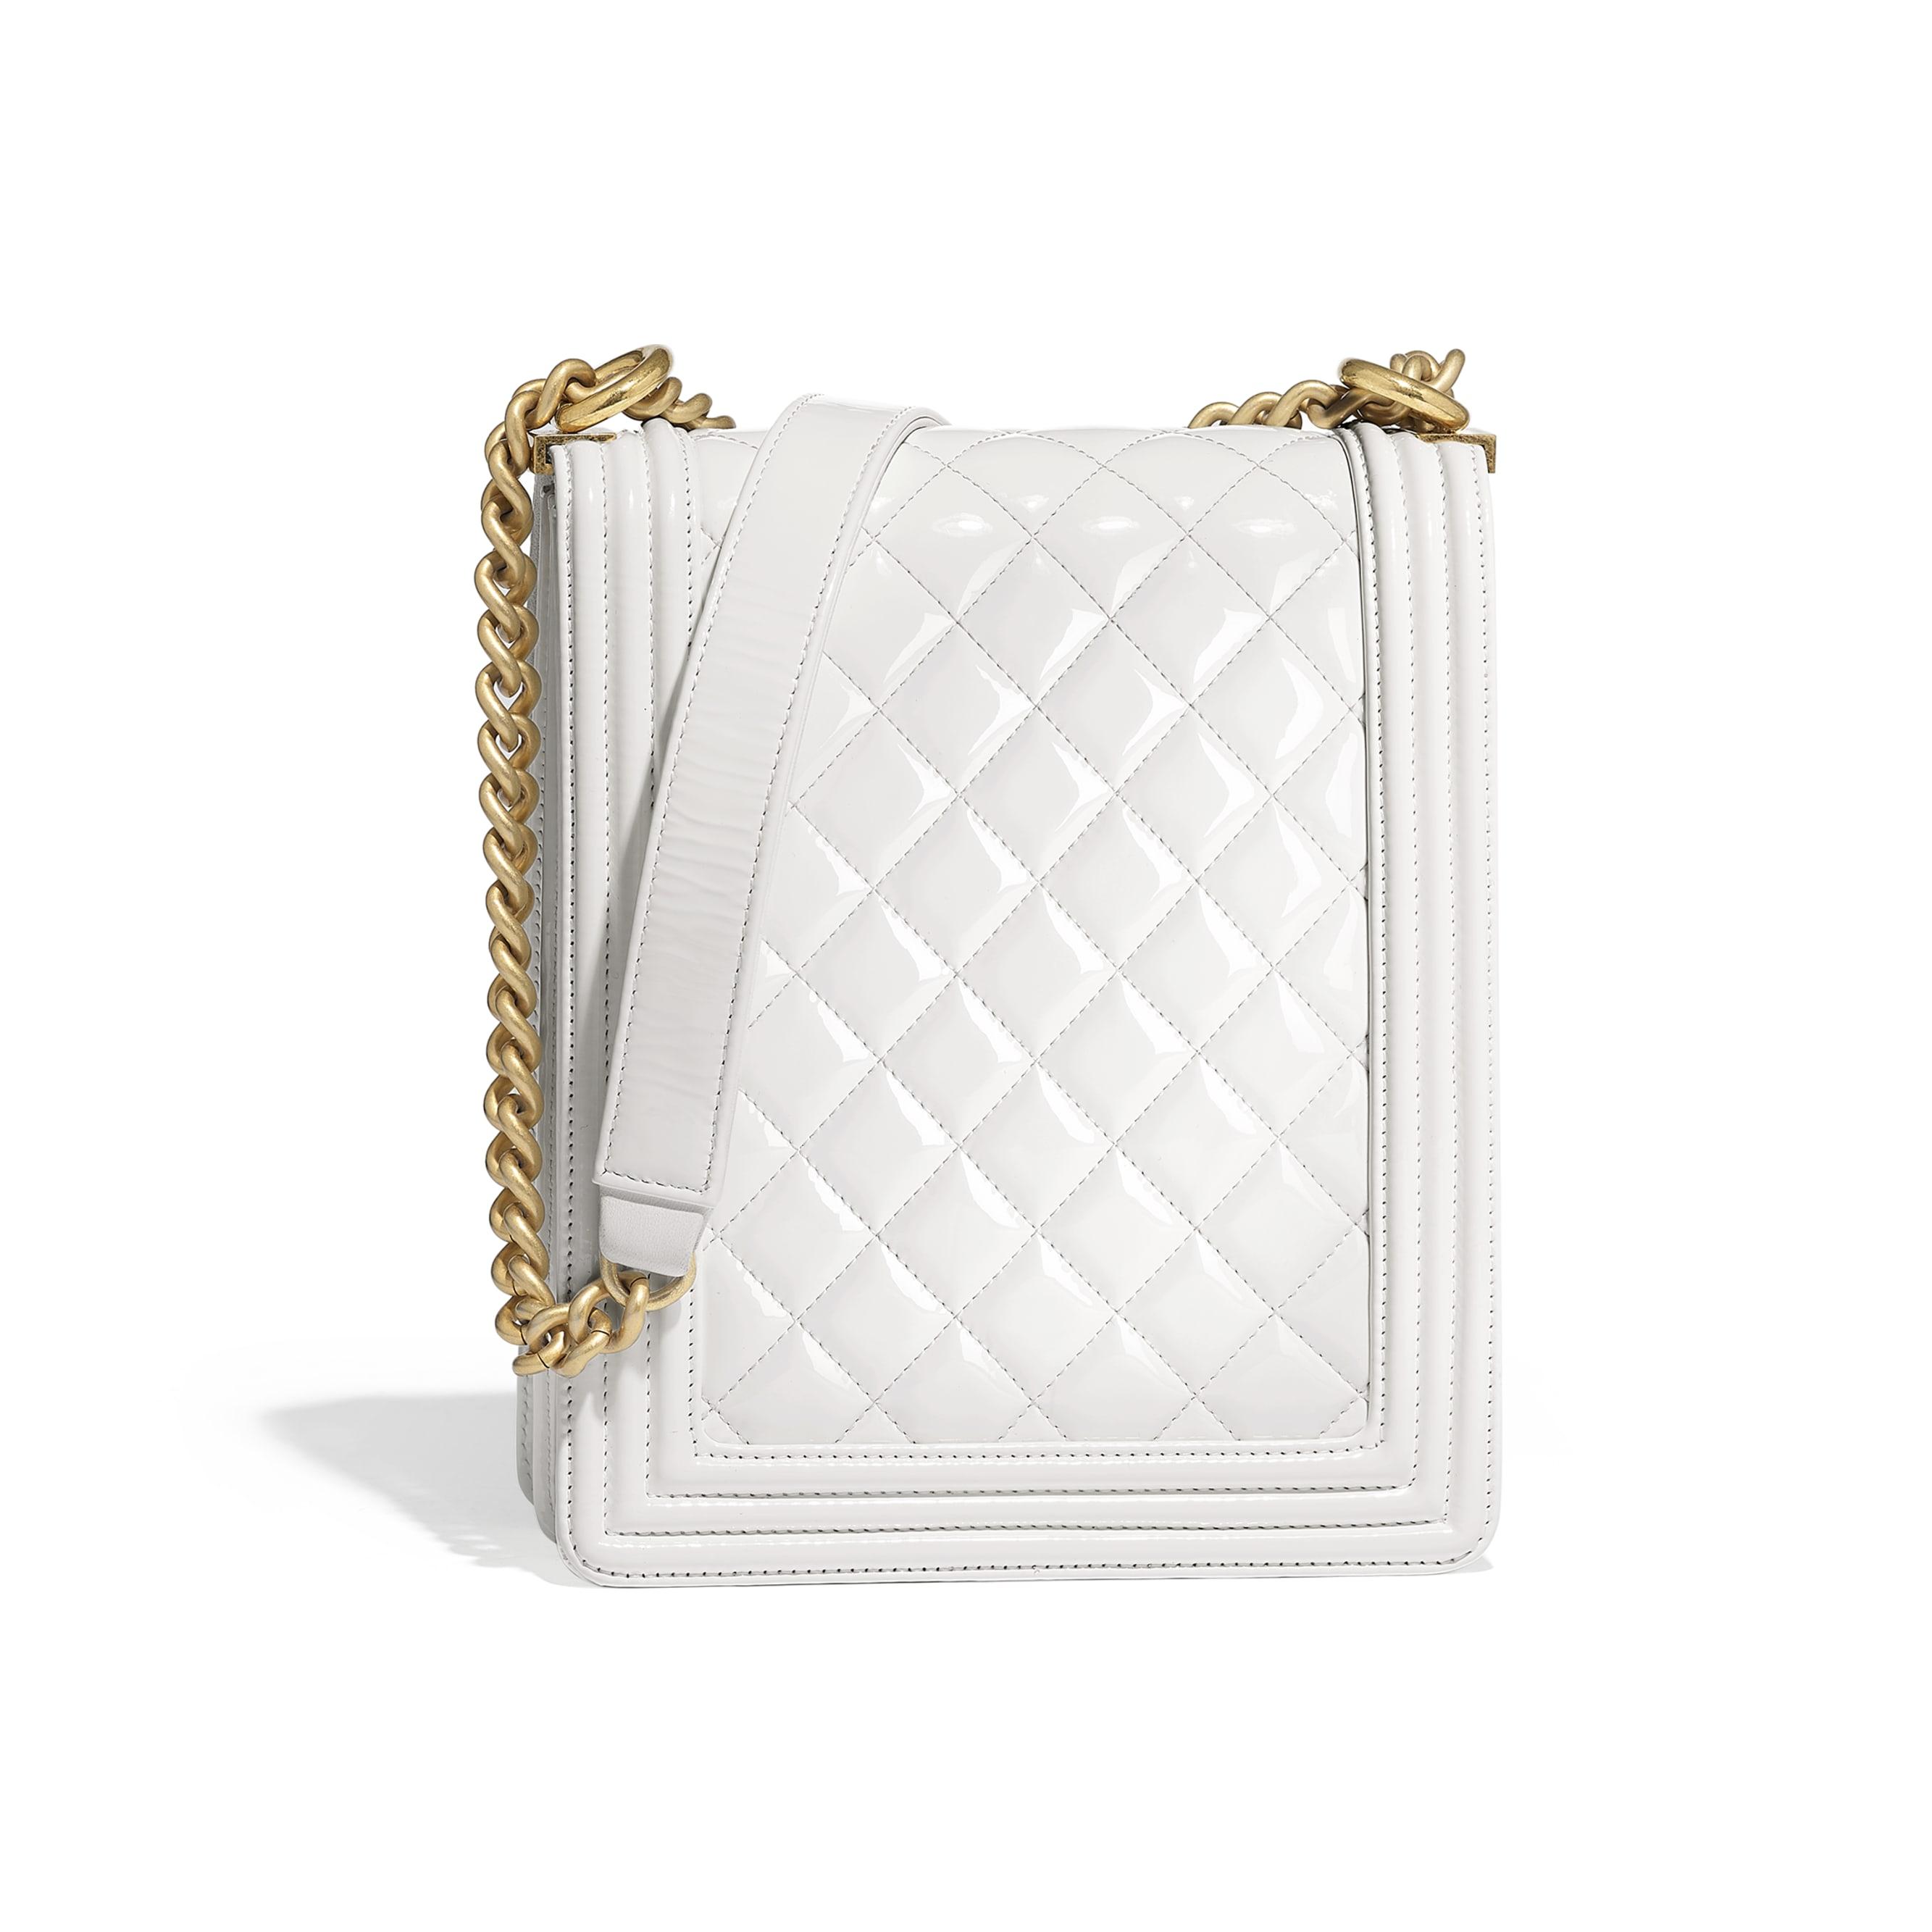 BOY CHANEL Handbag - White - Patent Calfskin & Gold-Tone Metal - Alternative view - see standard sized version